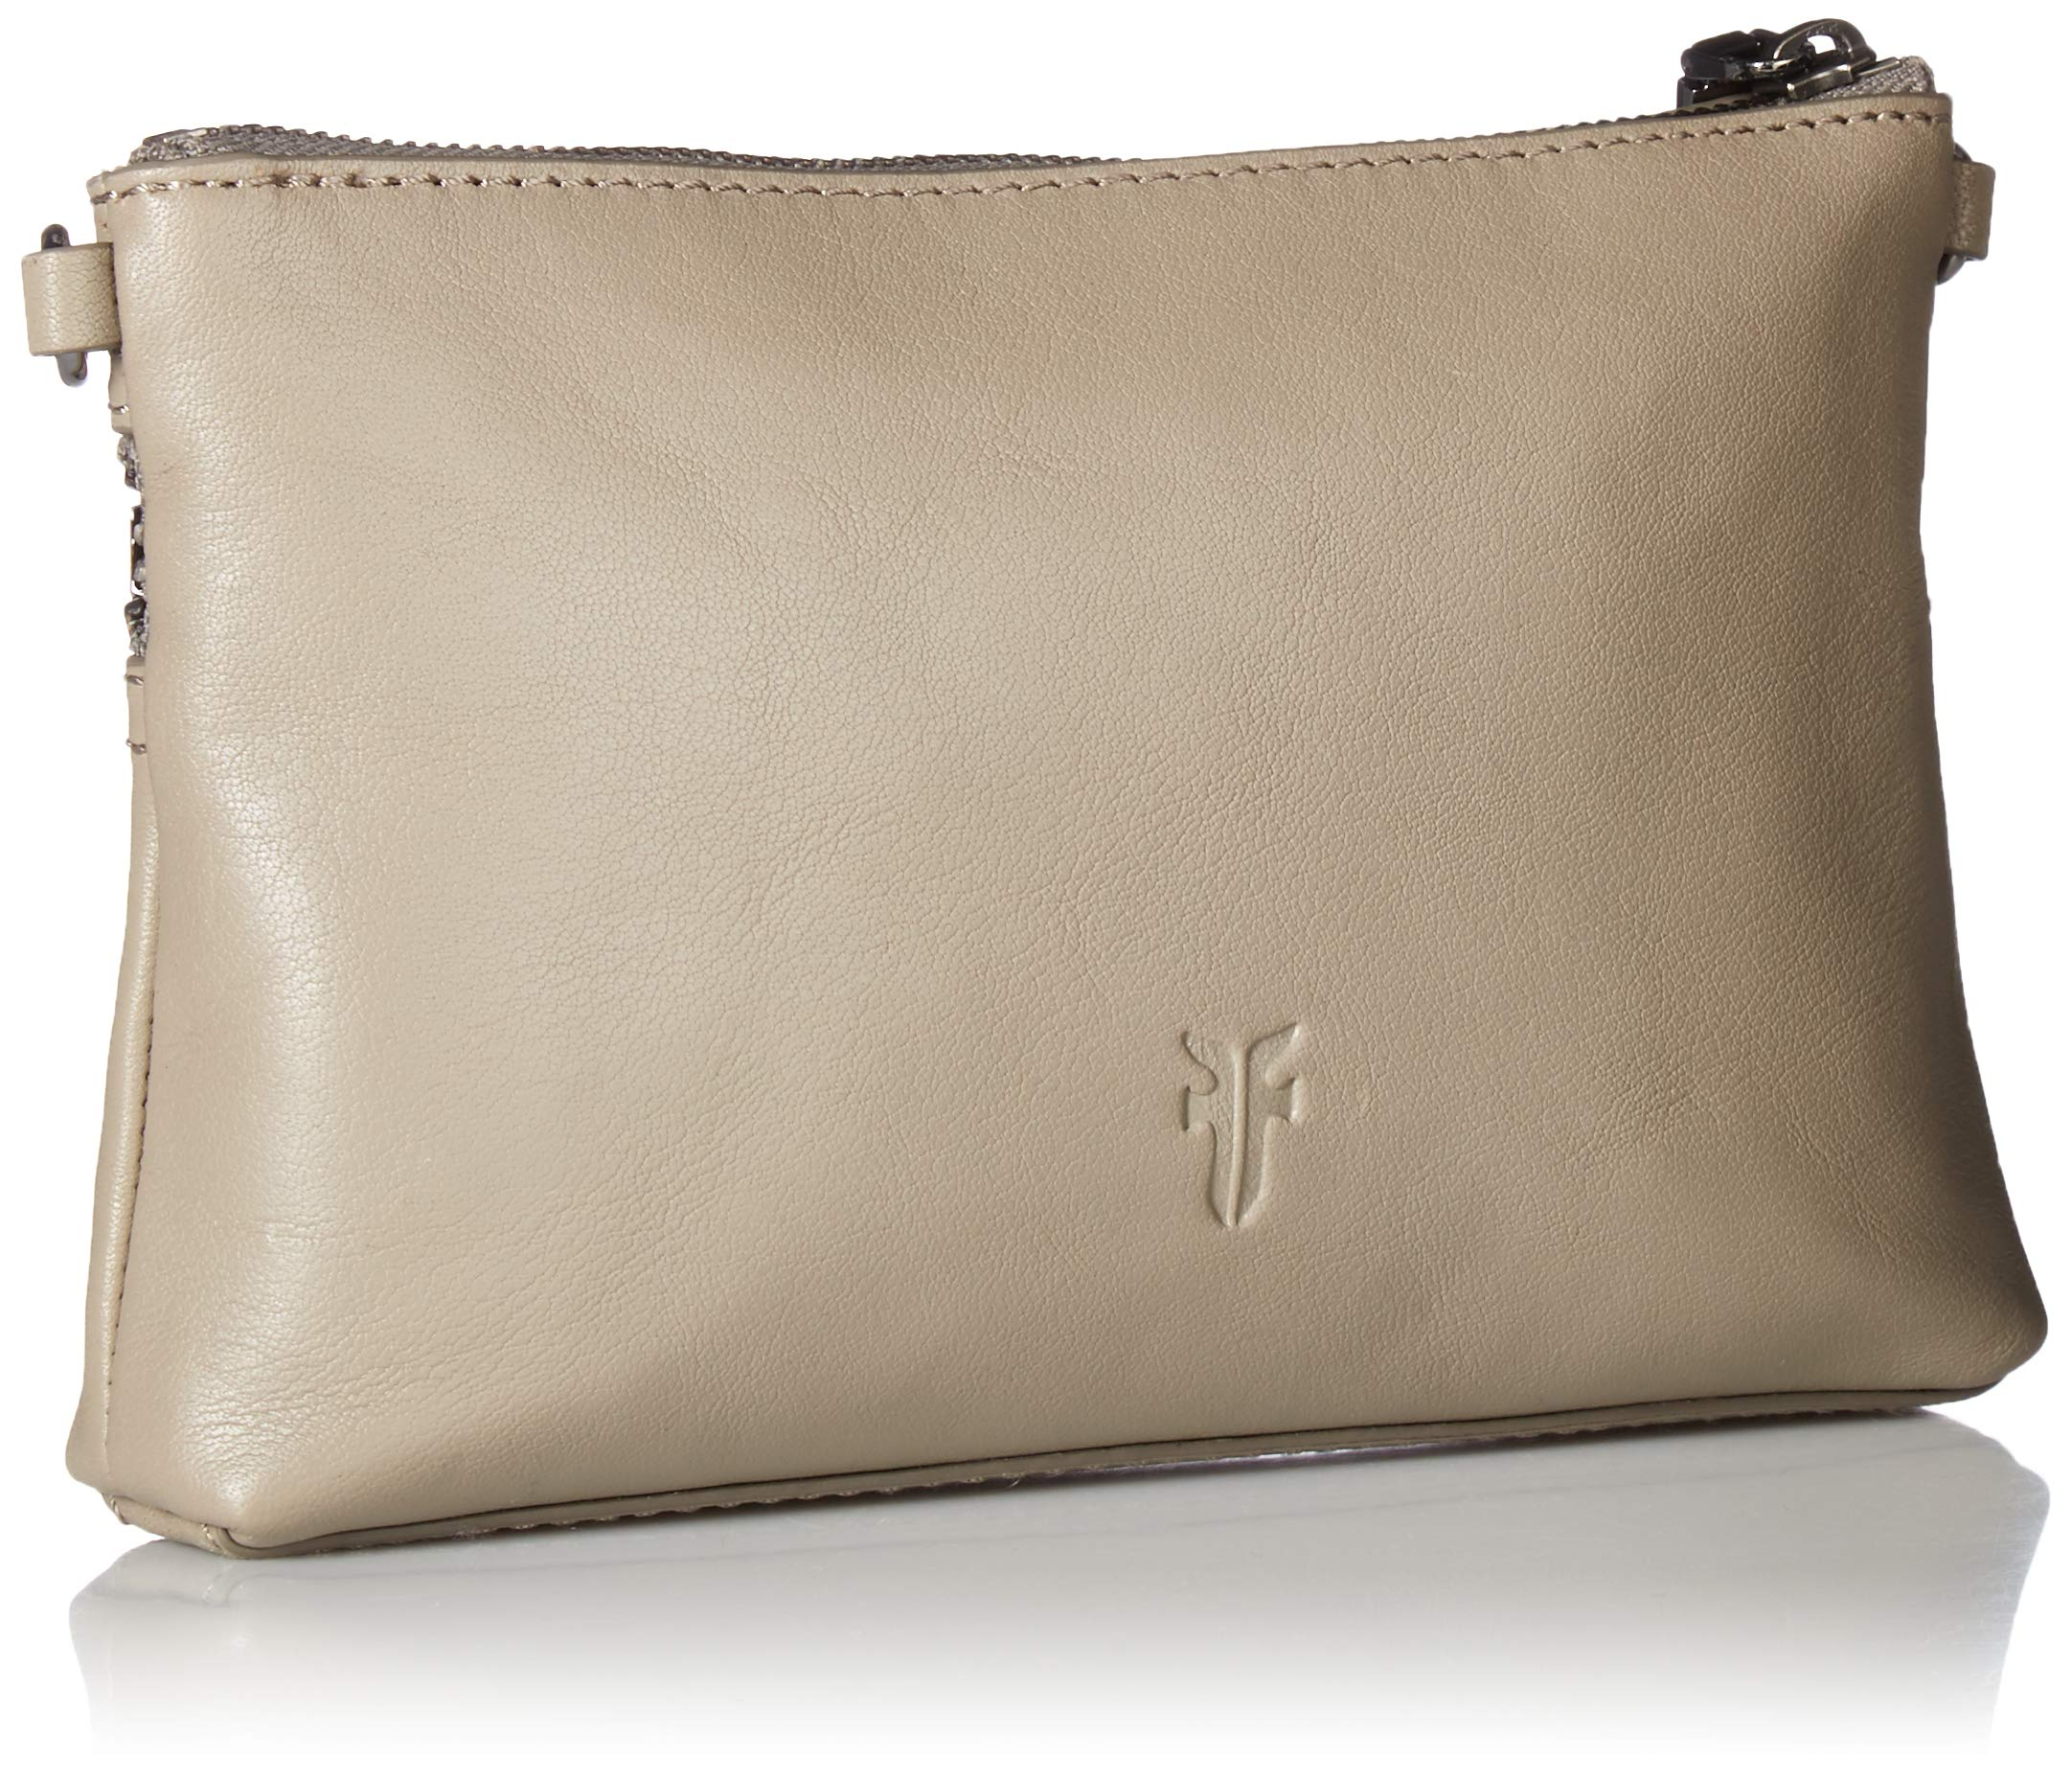 FRYE Lena Zip Leather Crossbody Wristlet Bag, grey by FRYE (Image #2)